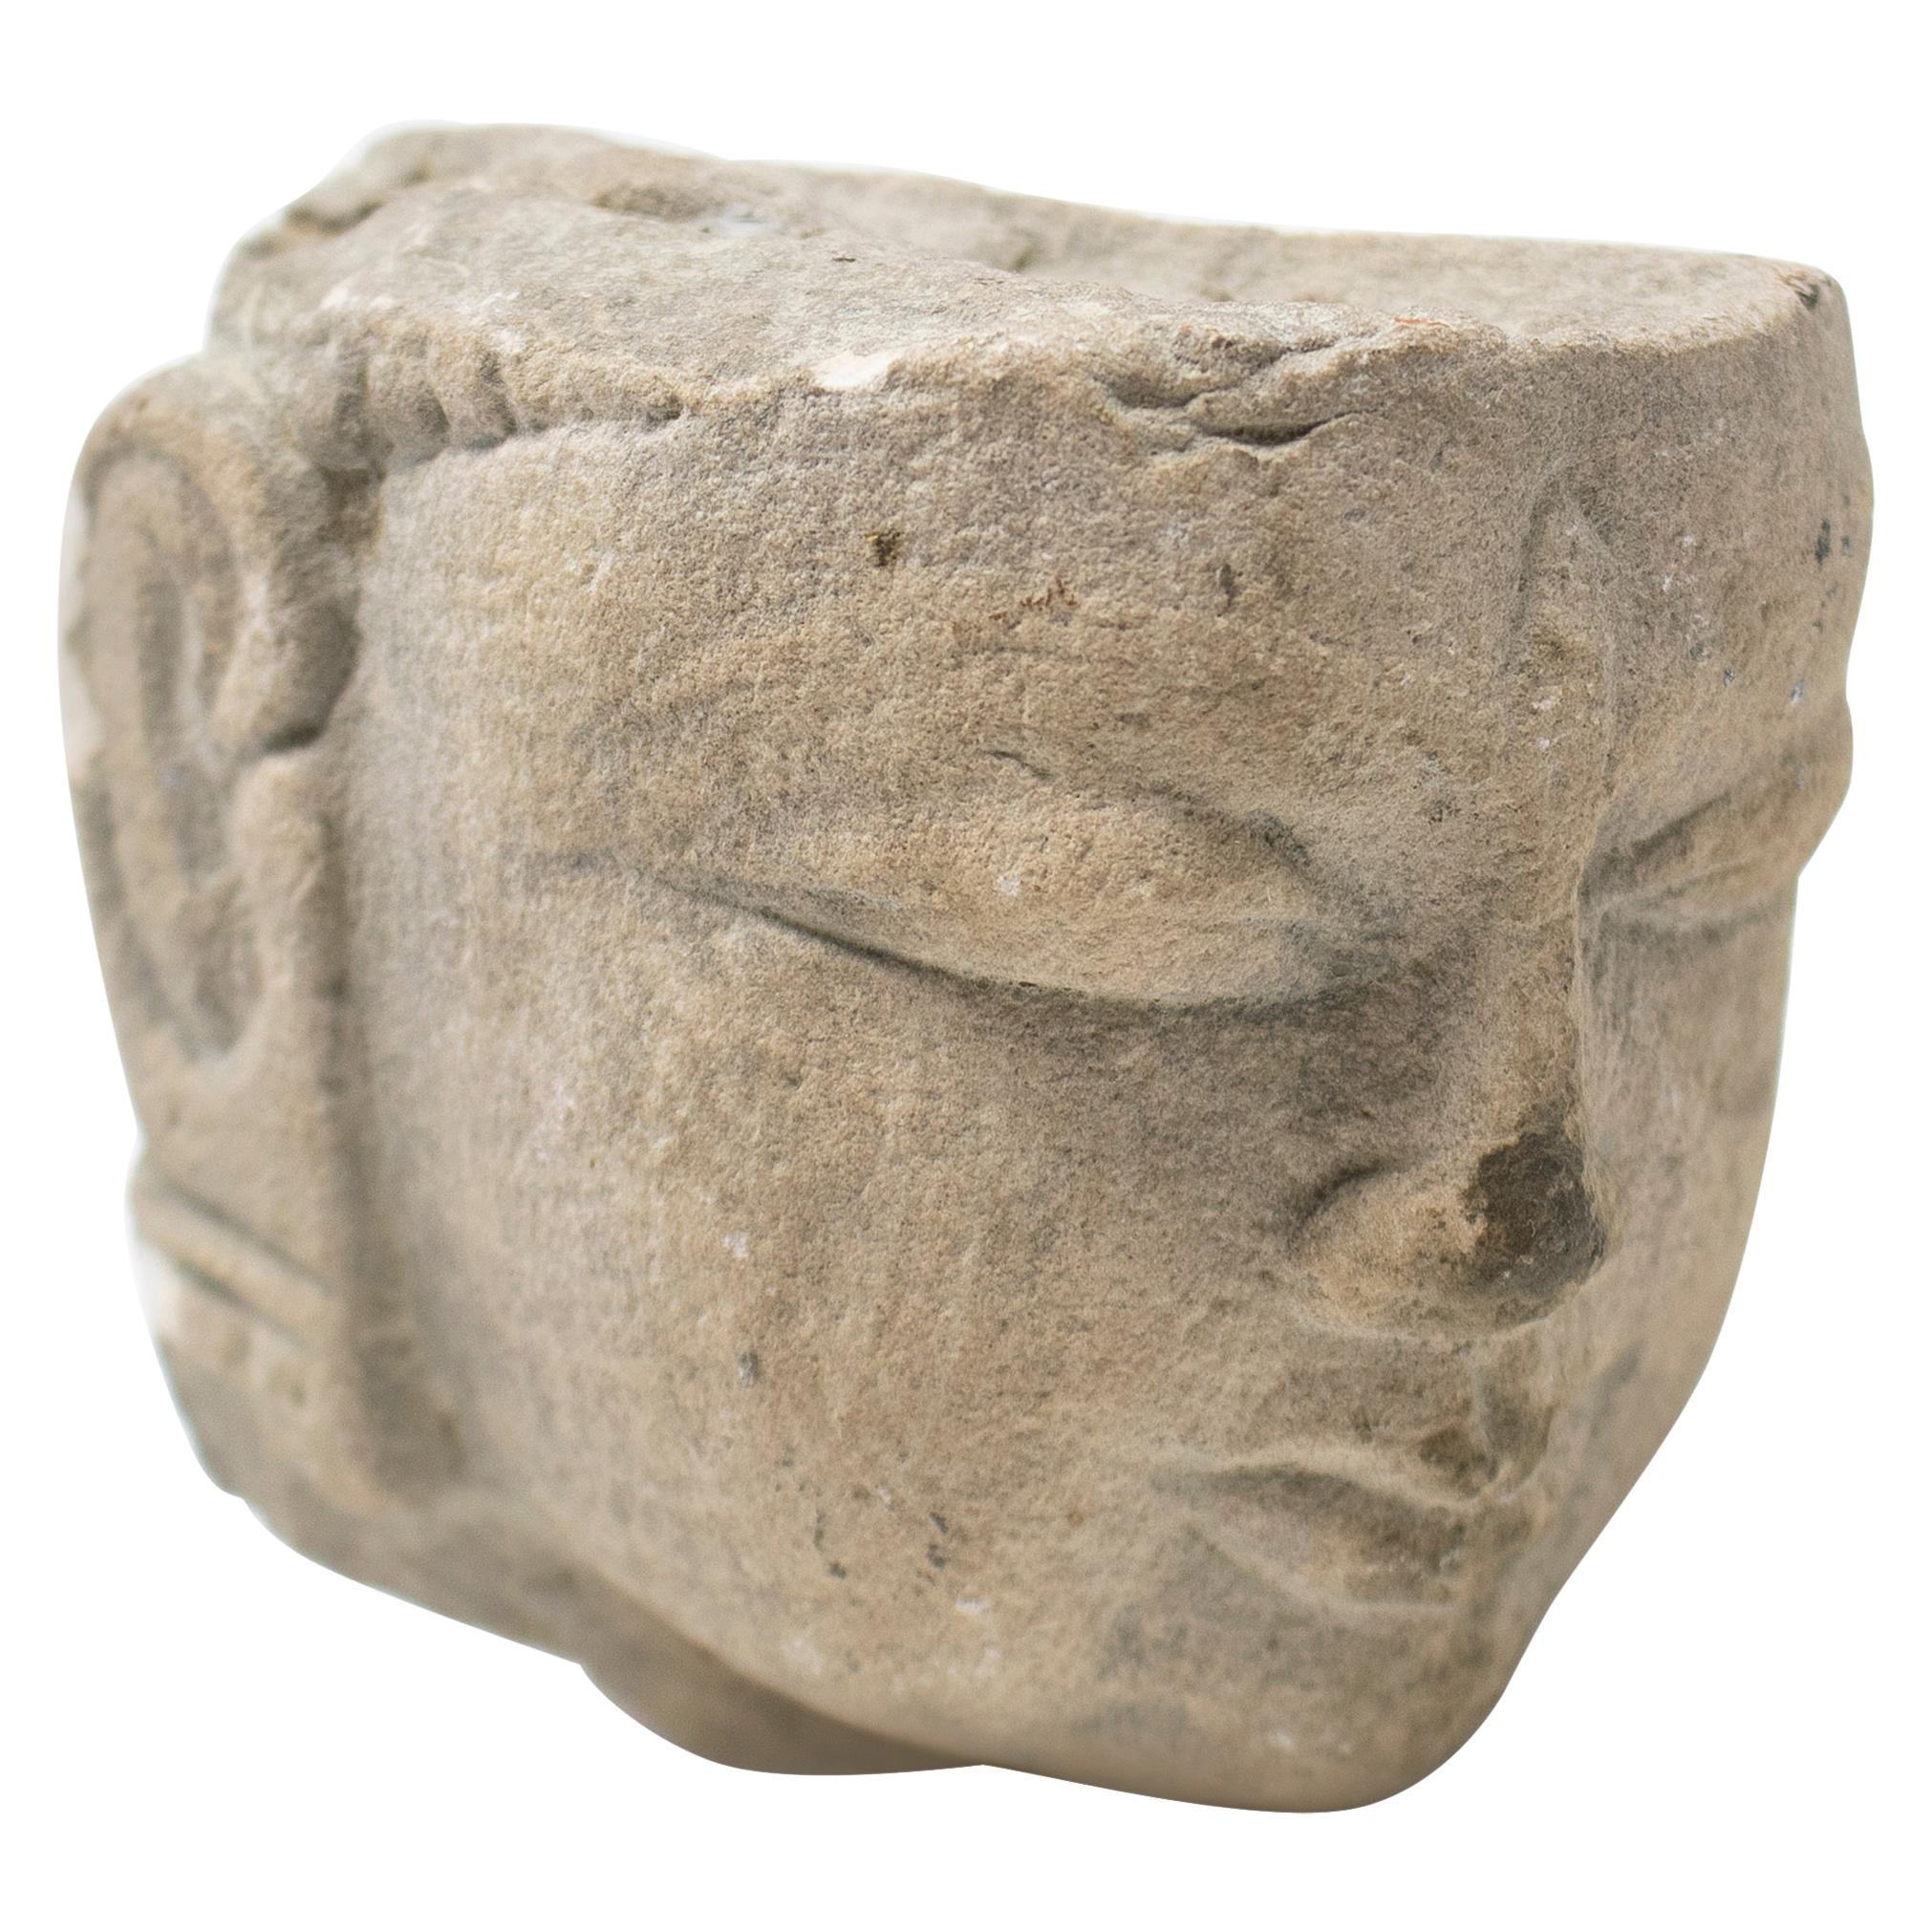 1970s Indian Khajuraho Love Temples Hand Carved Sandstone Buddha Head Sculpture